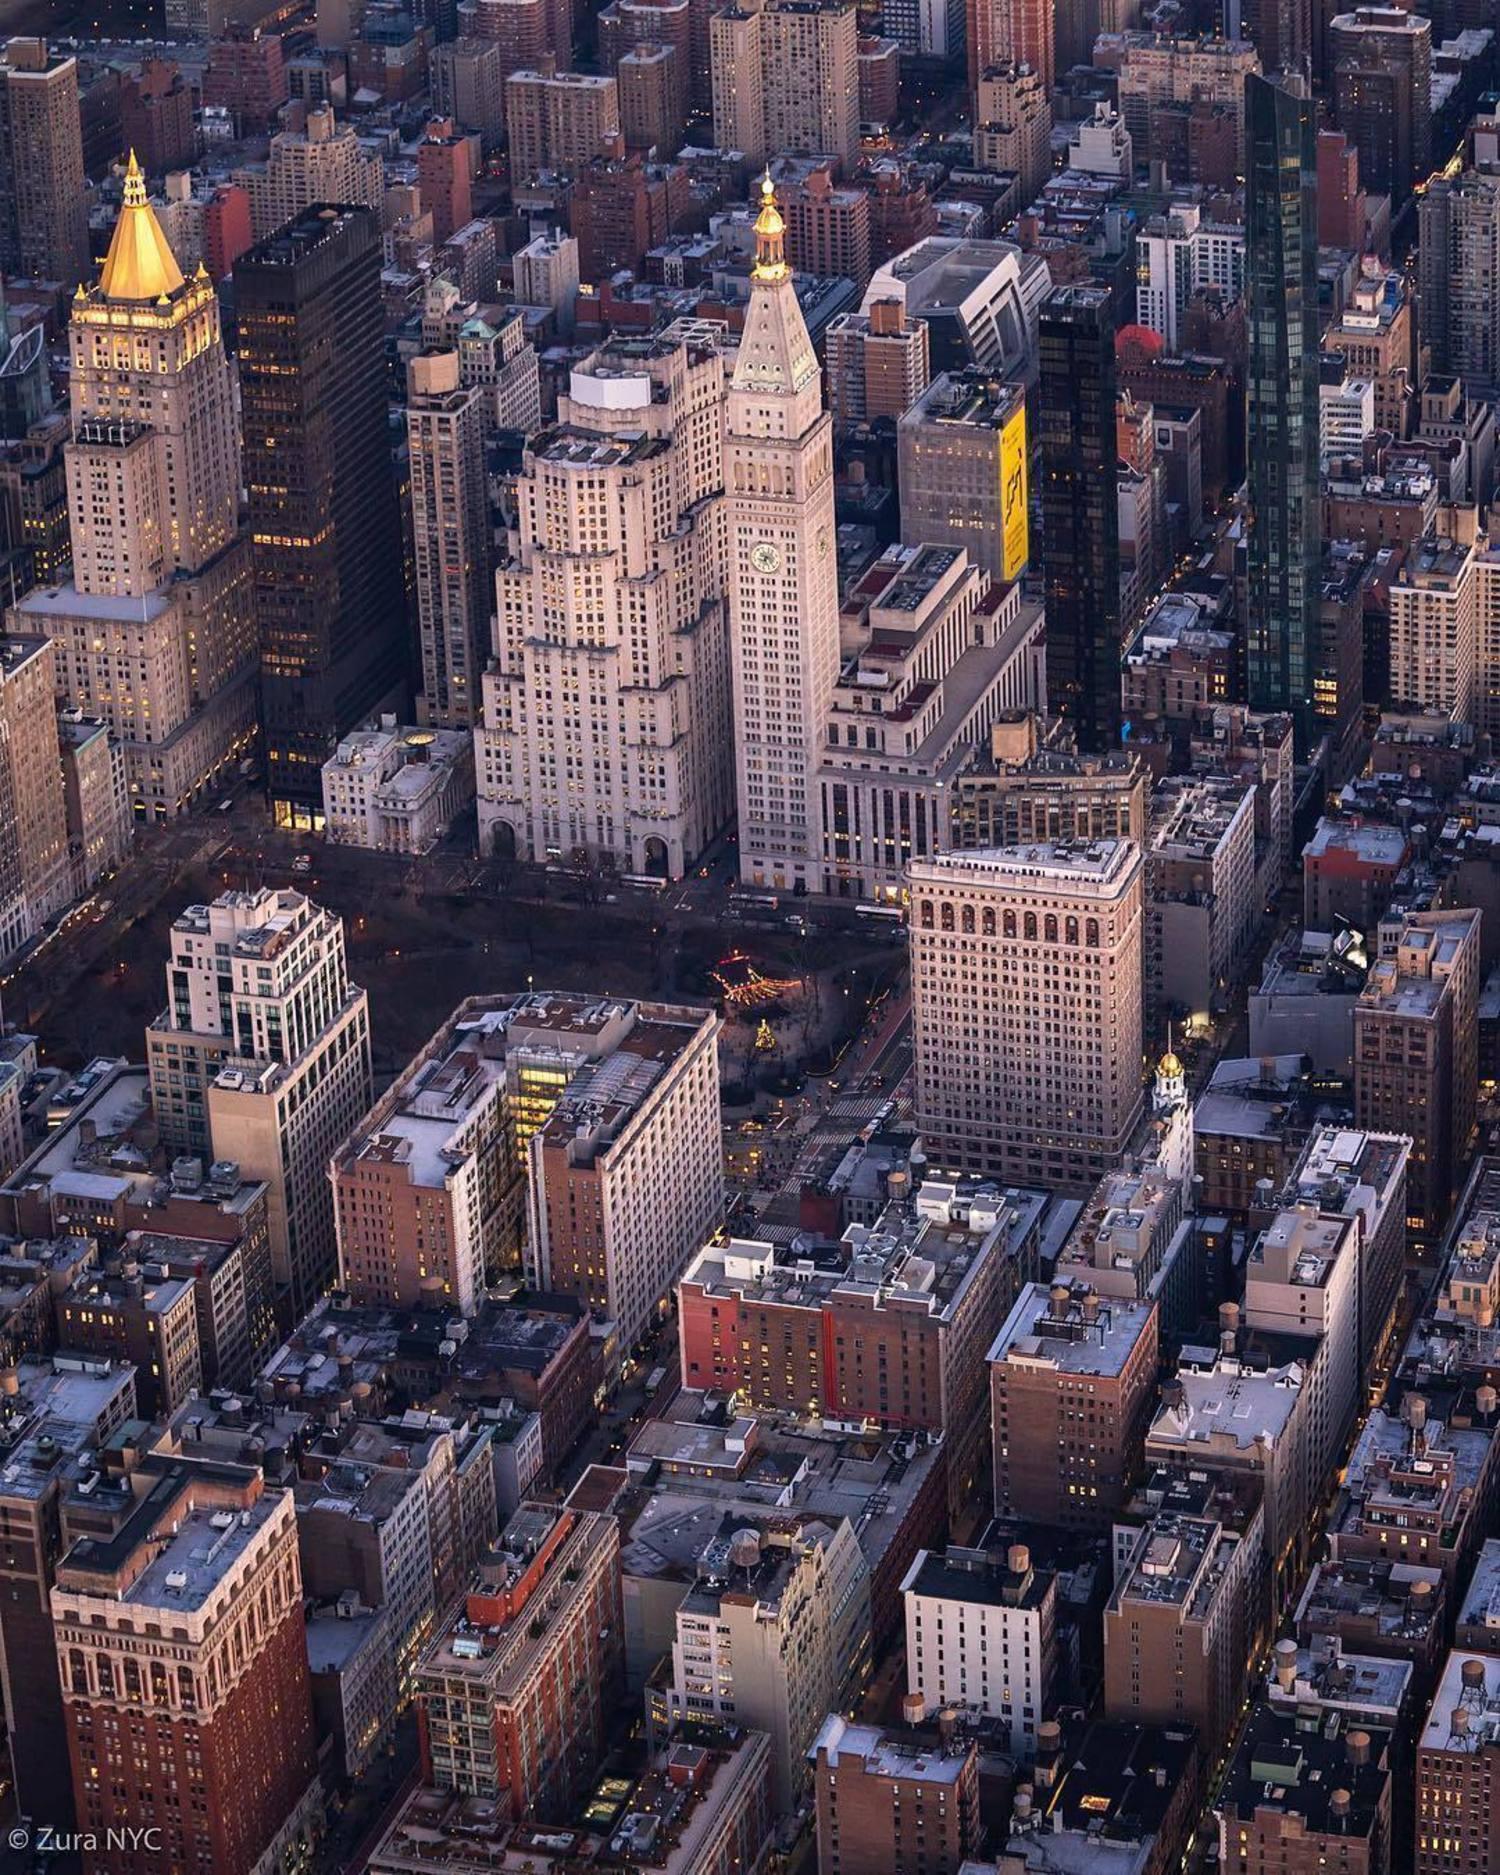 Flatiron District, Manhattan. Photo via @zura.nyc #viewingnyc #newyork #newyorkcity #nyc #flatirondistrict